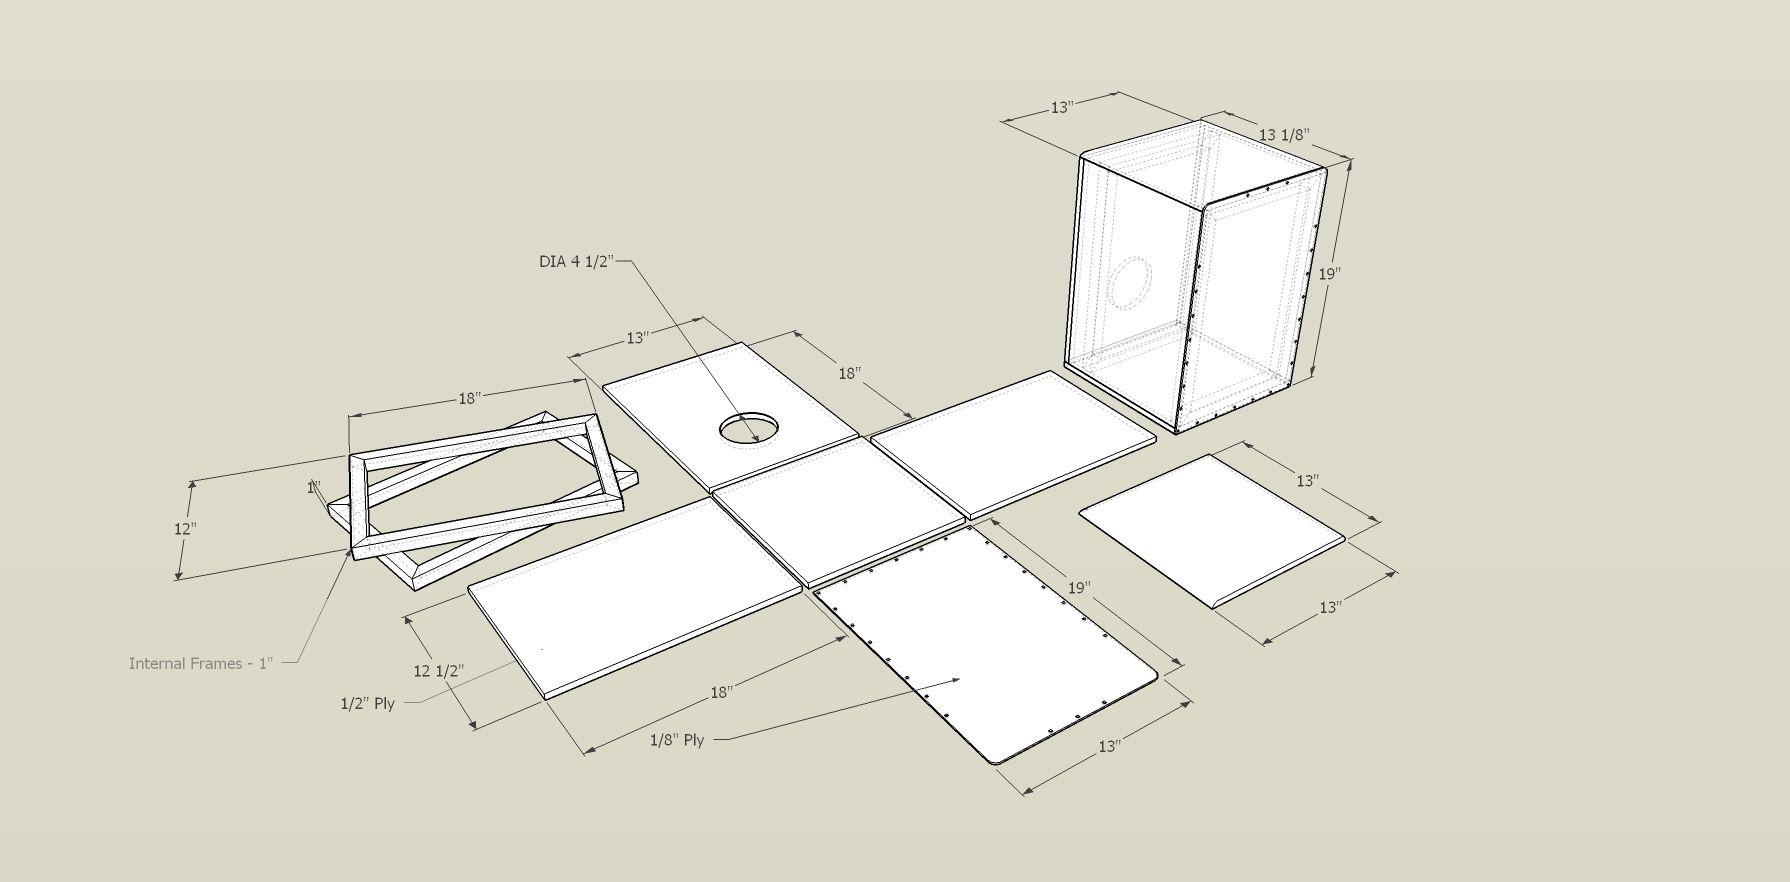 Great Layout Of Demensions For Diy Cajon Cajon Box Drum Drum Box Cajon Drum